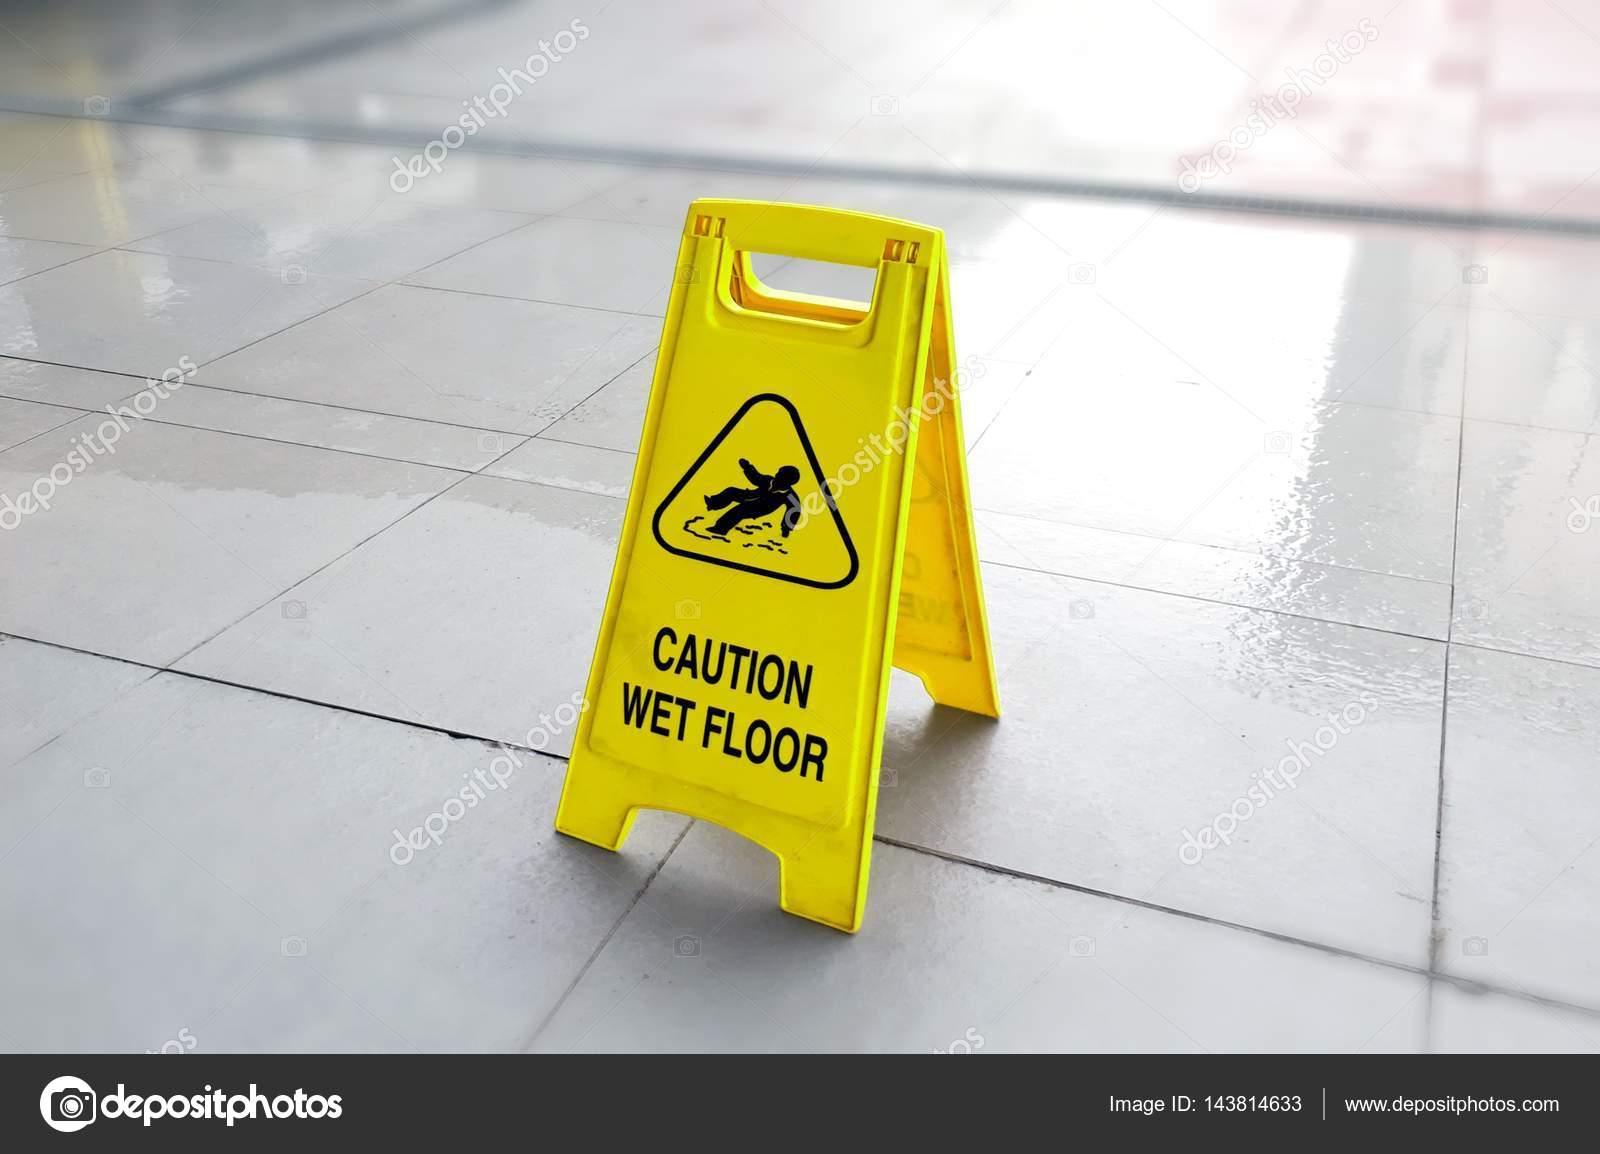 Pavimento bagnato cautela u2014 foto stock © razihusin #143814633